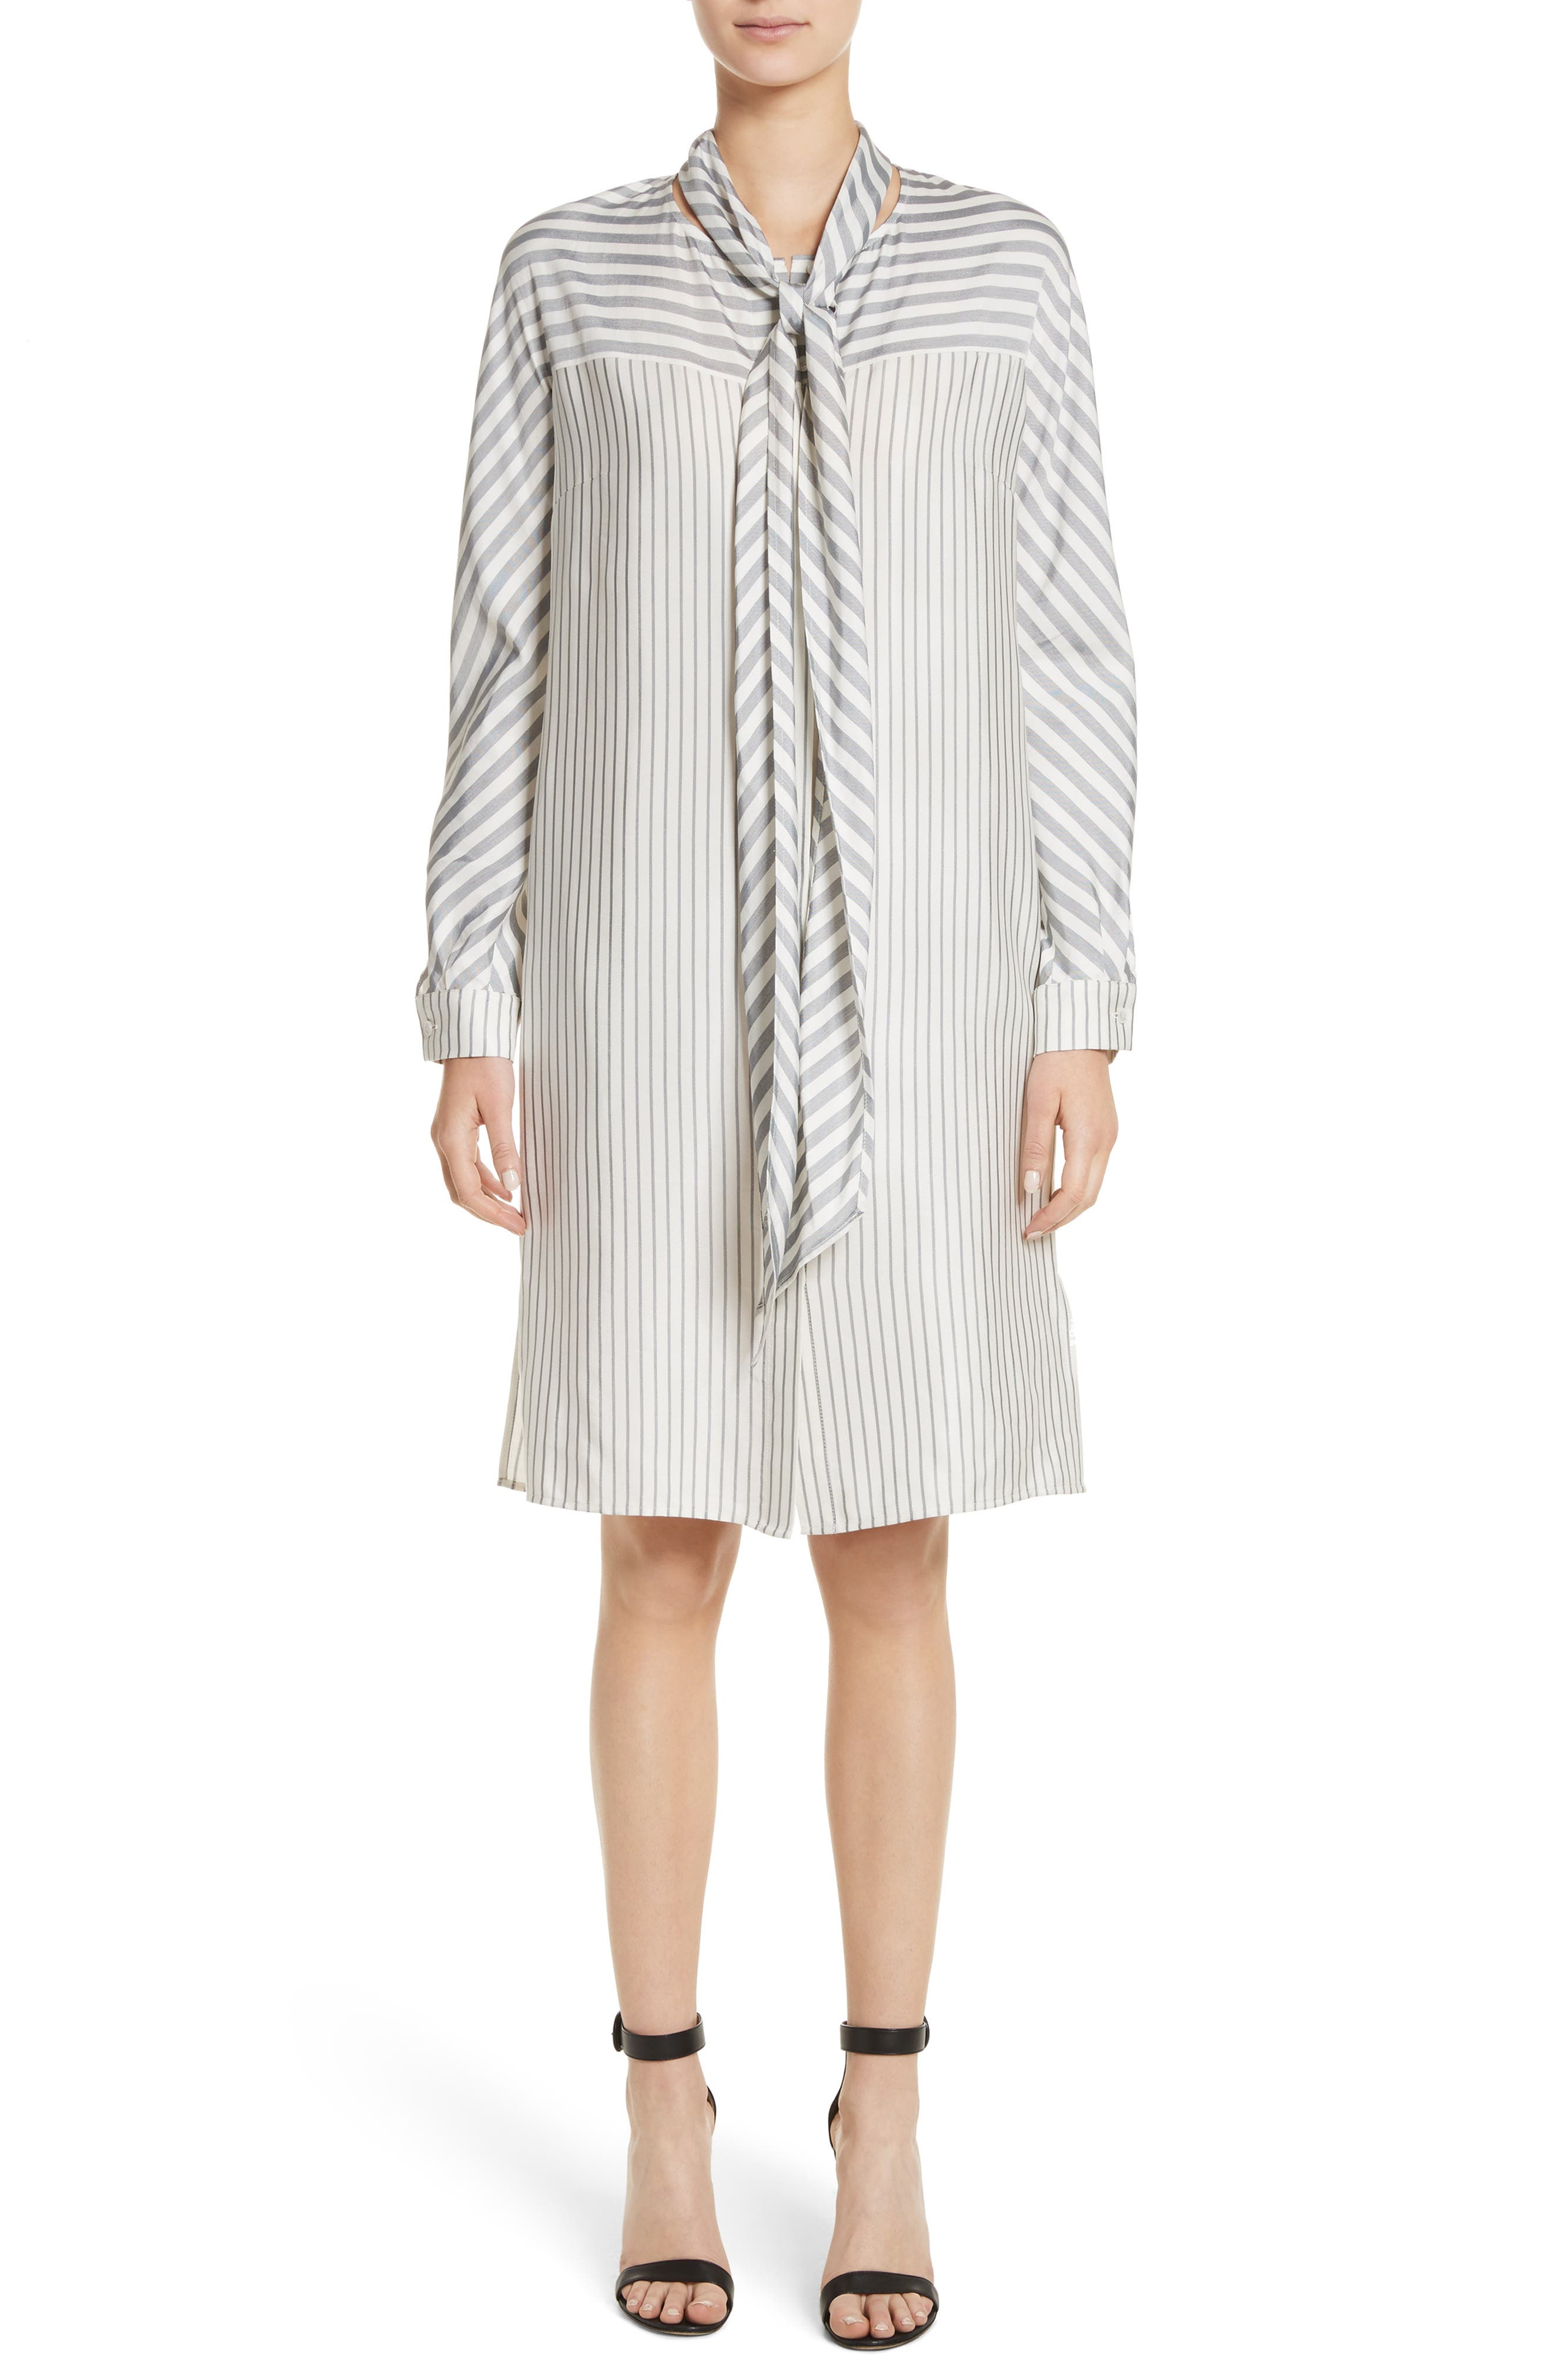 ST. JOHN COLLECTION,                             Stripe Tie Neck Shirtdress,                             Main thumbnail 1, color,                             900